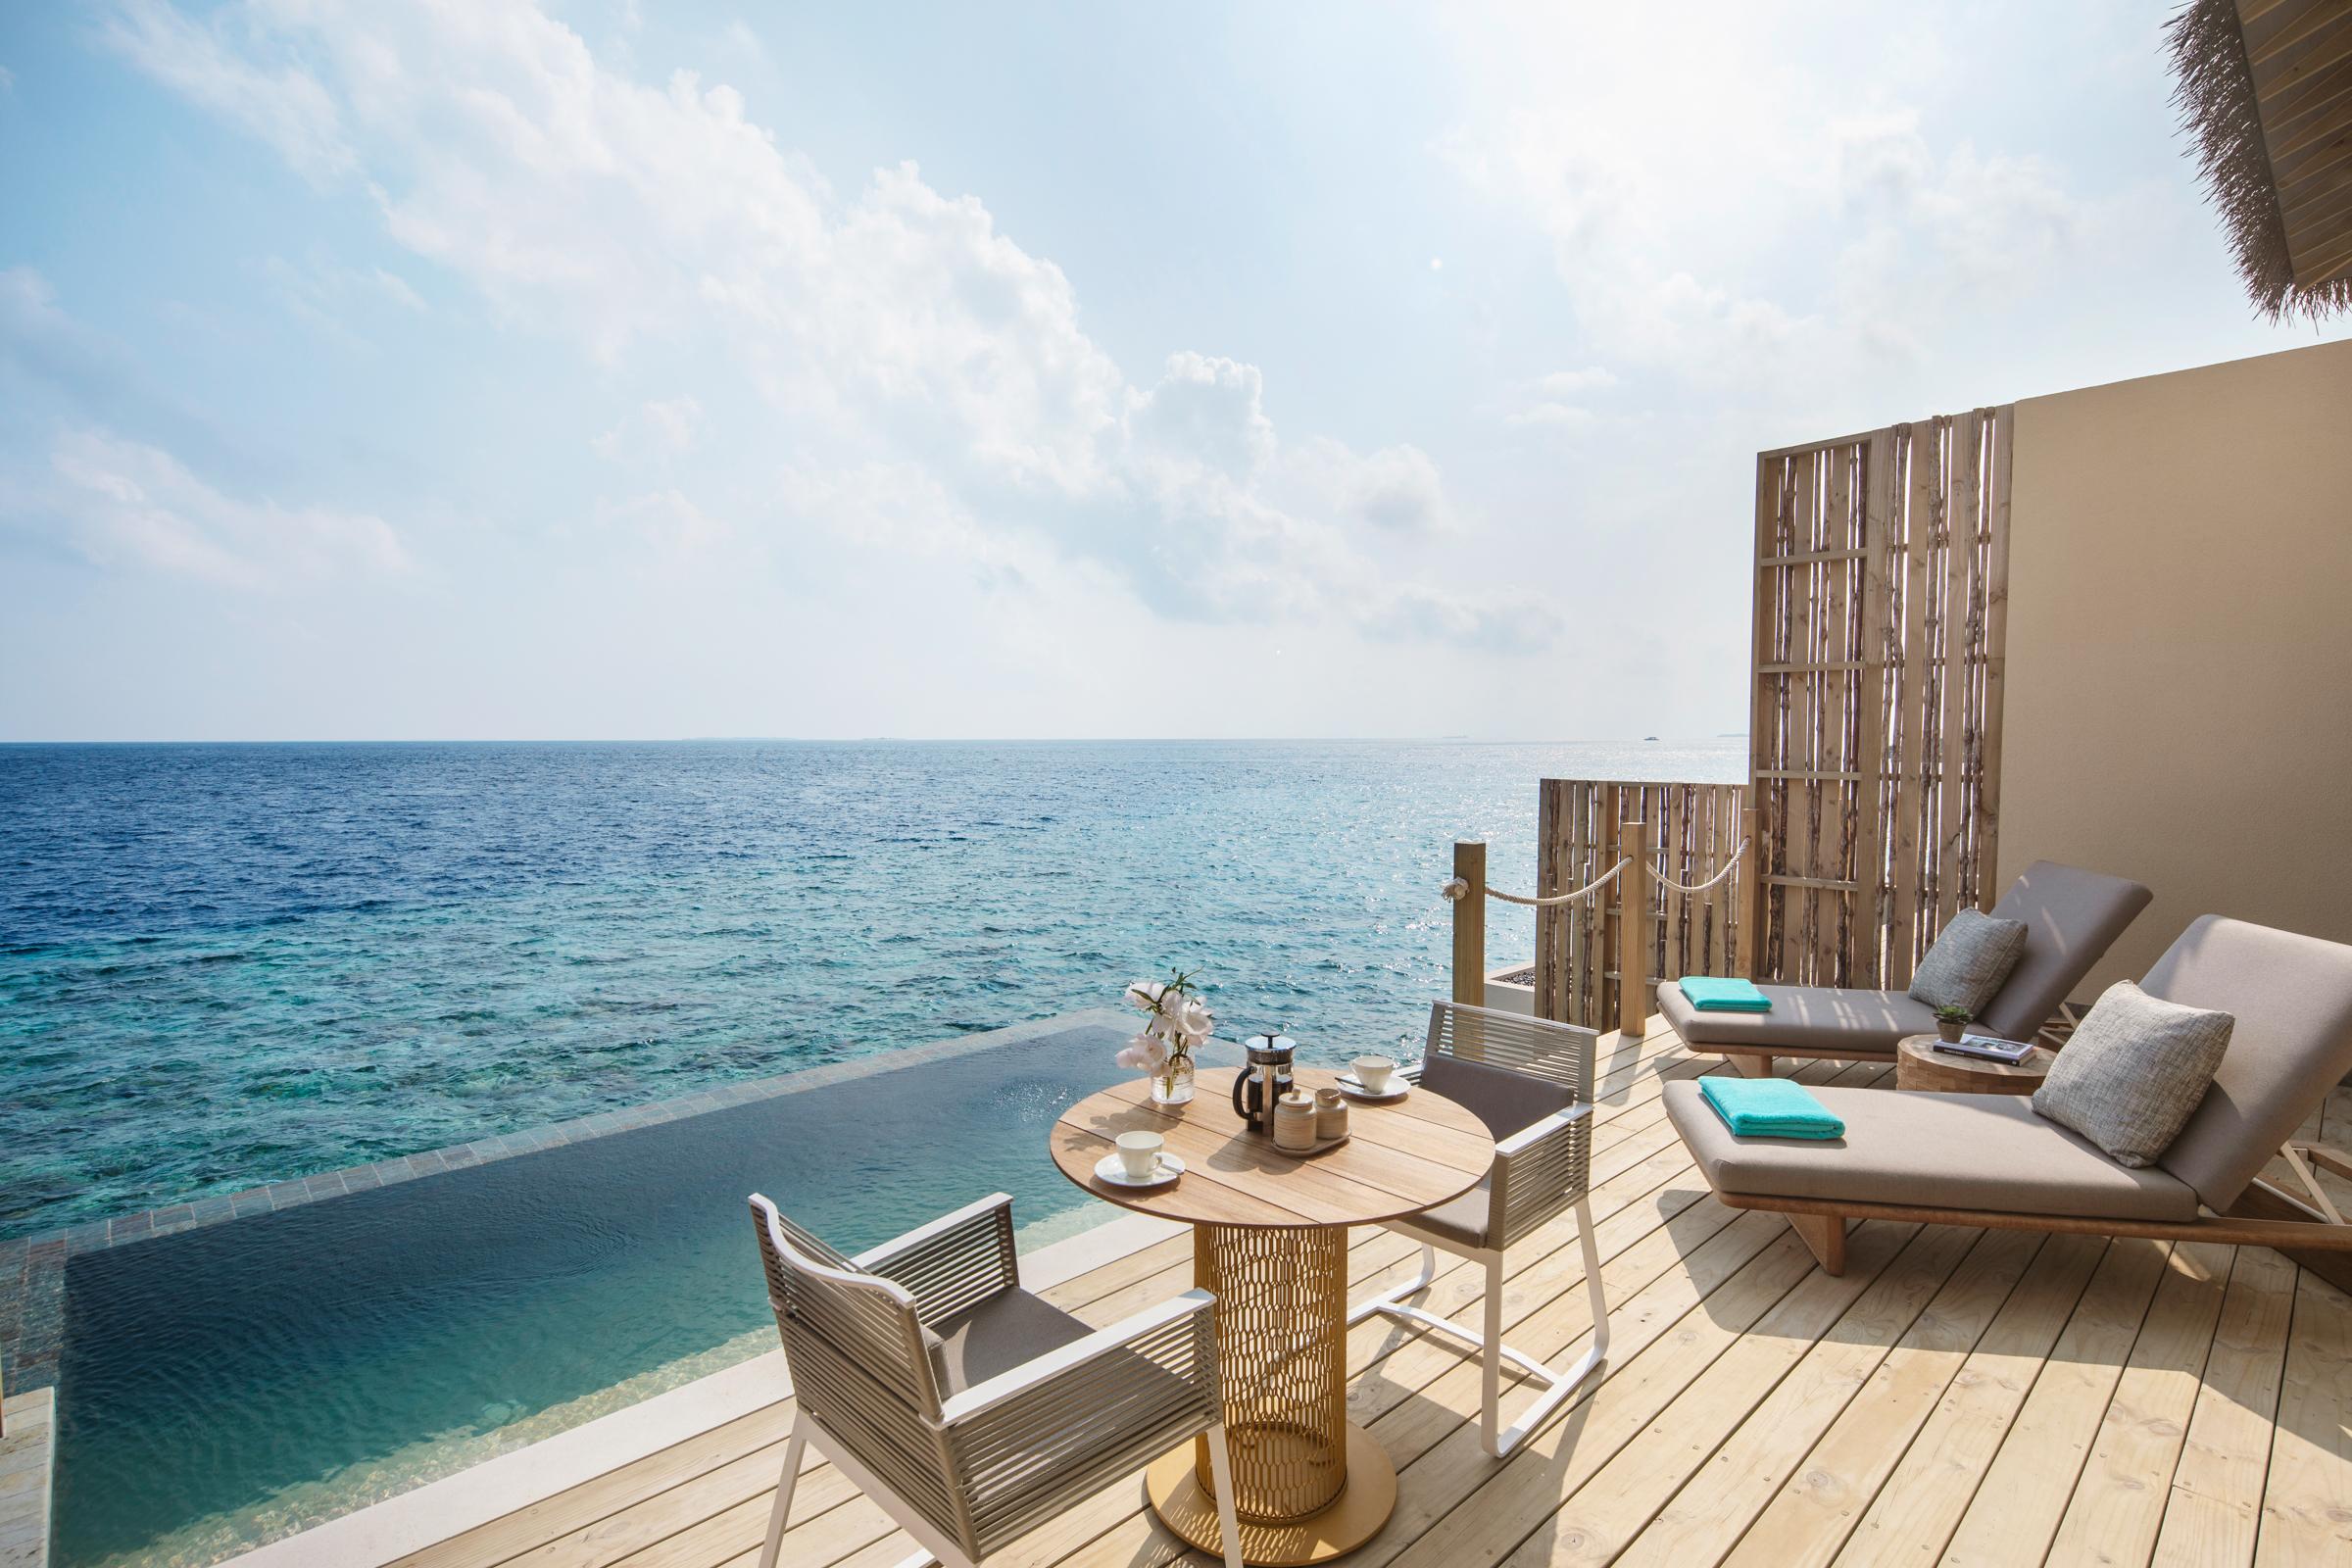 Photo Credit: InterContinental Maldives